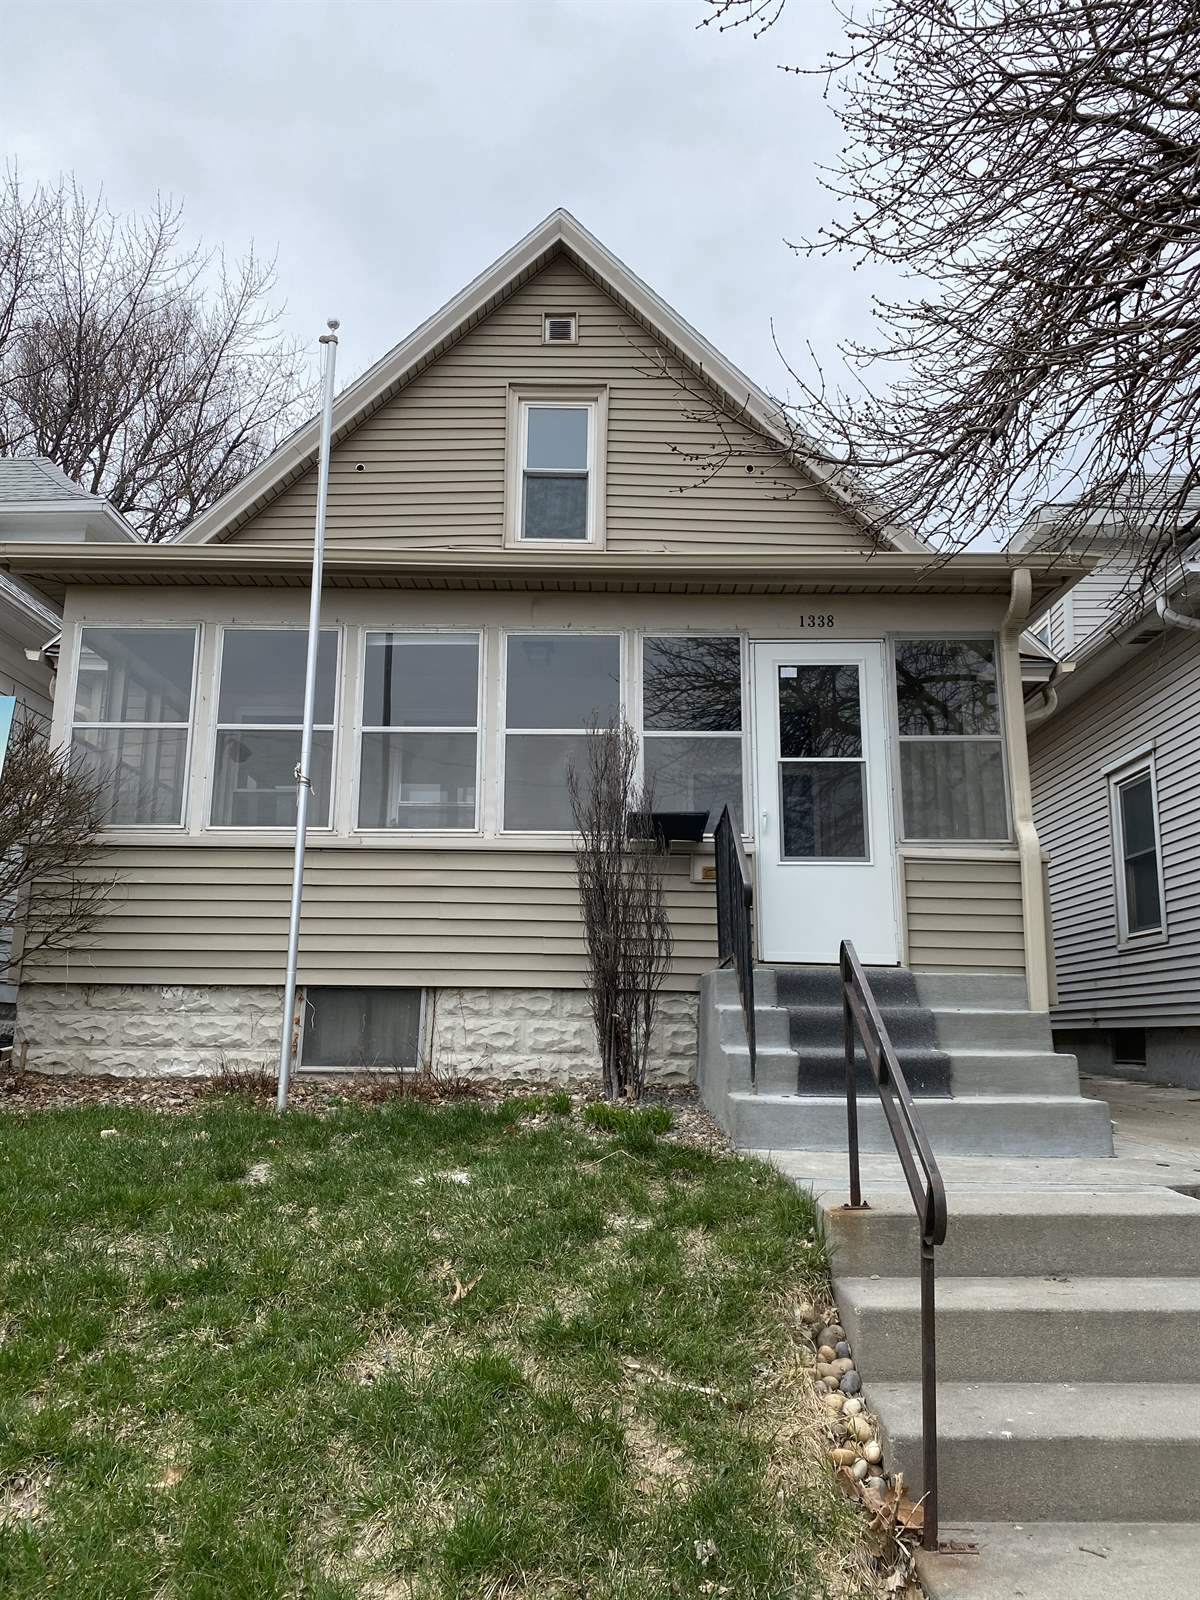 1338 South 21 Street, Omaha, NE 68108